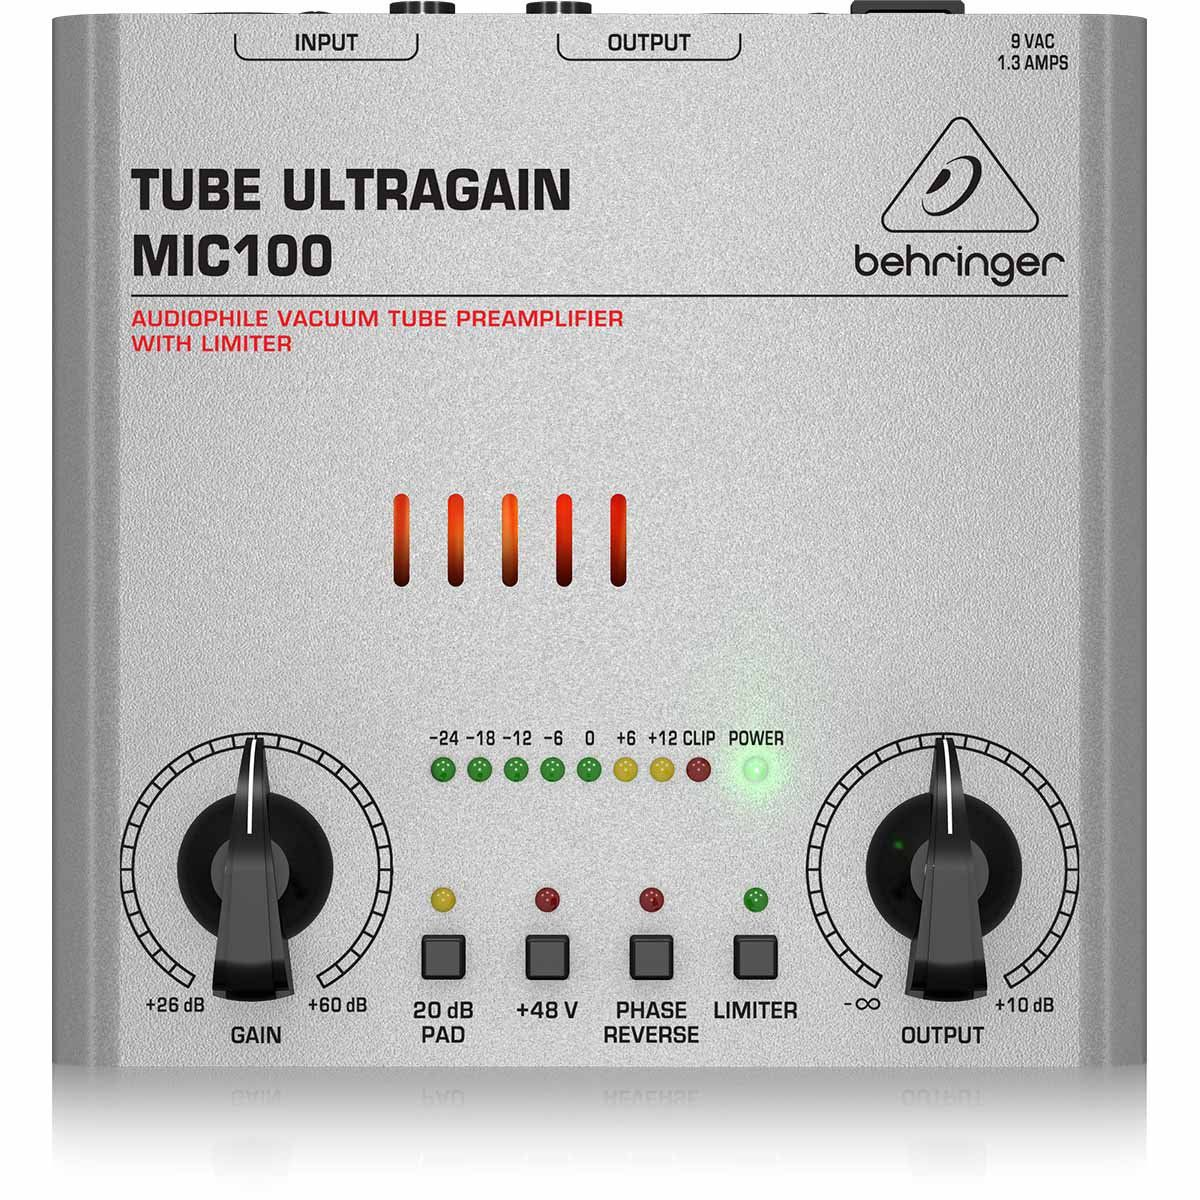 Behringer MIC100 Tube UltraGain Pré Amplificador MIC100 Tube UltraGain 110V